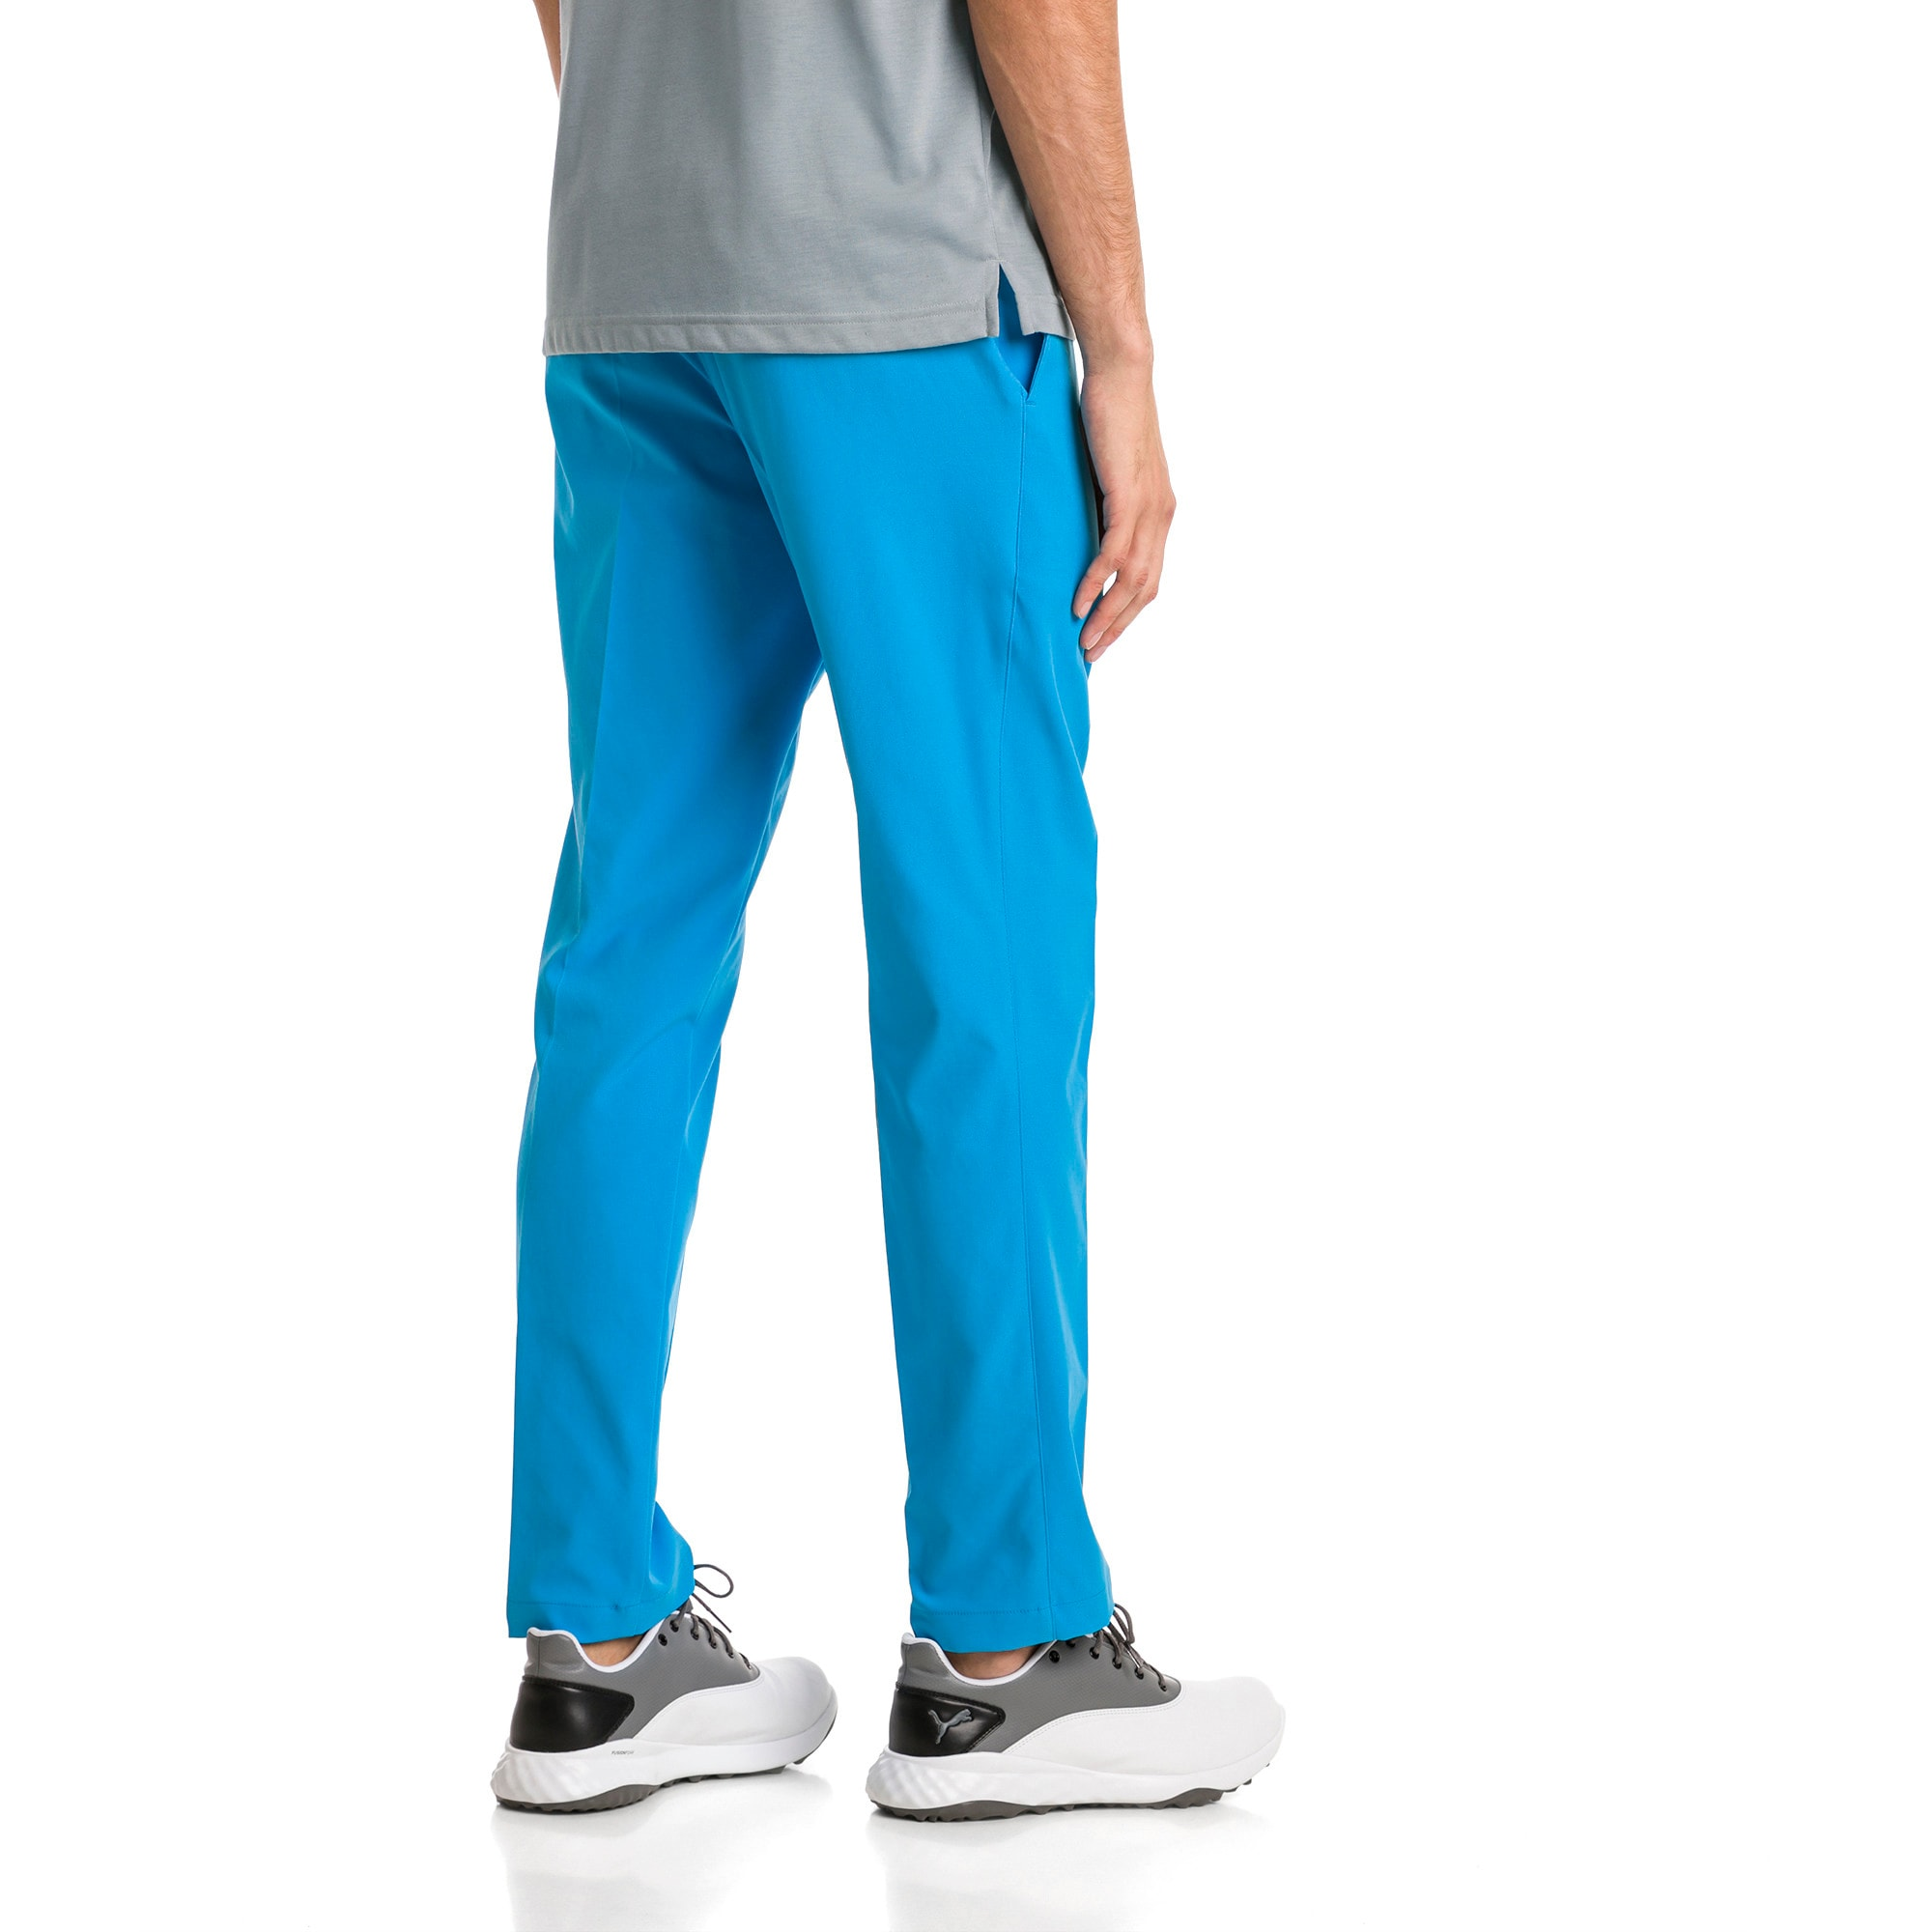 Thumbnail 2 of Afkledende geweven Jackpot golfbroek voor heren, Bleu Azur, medium